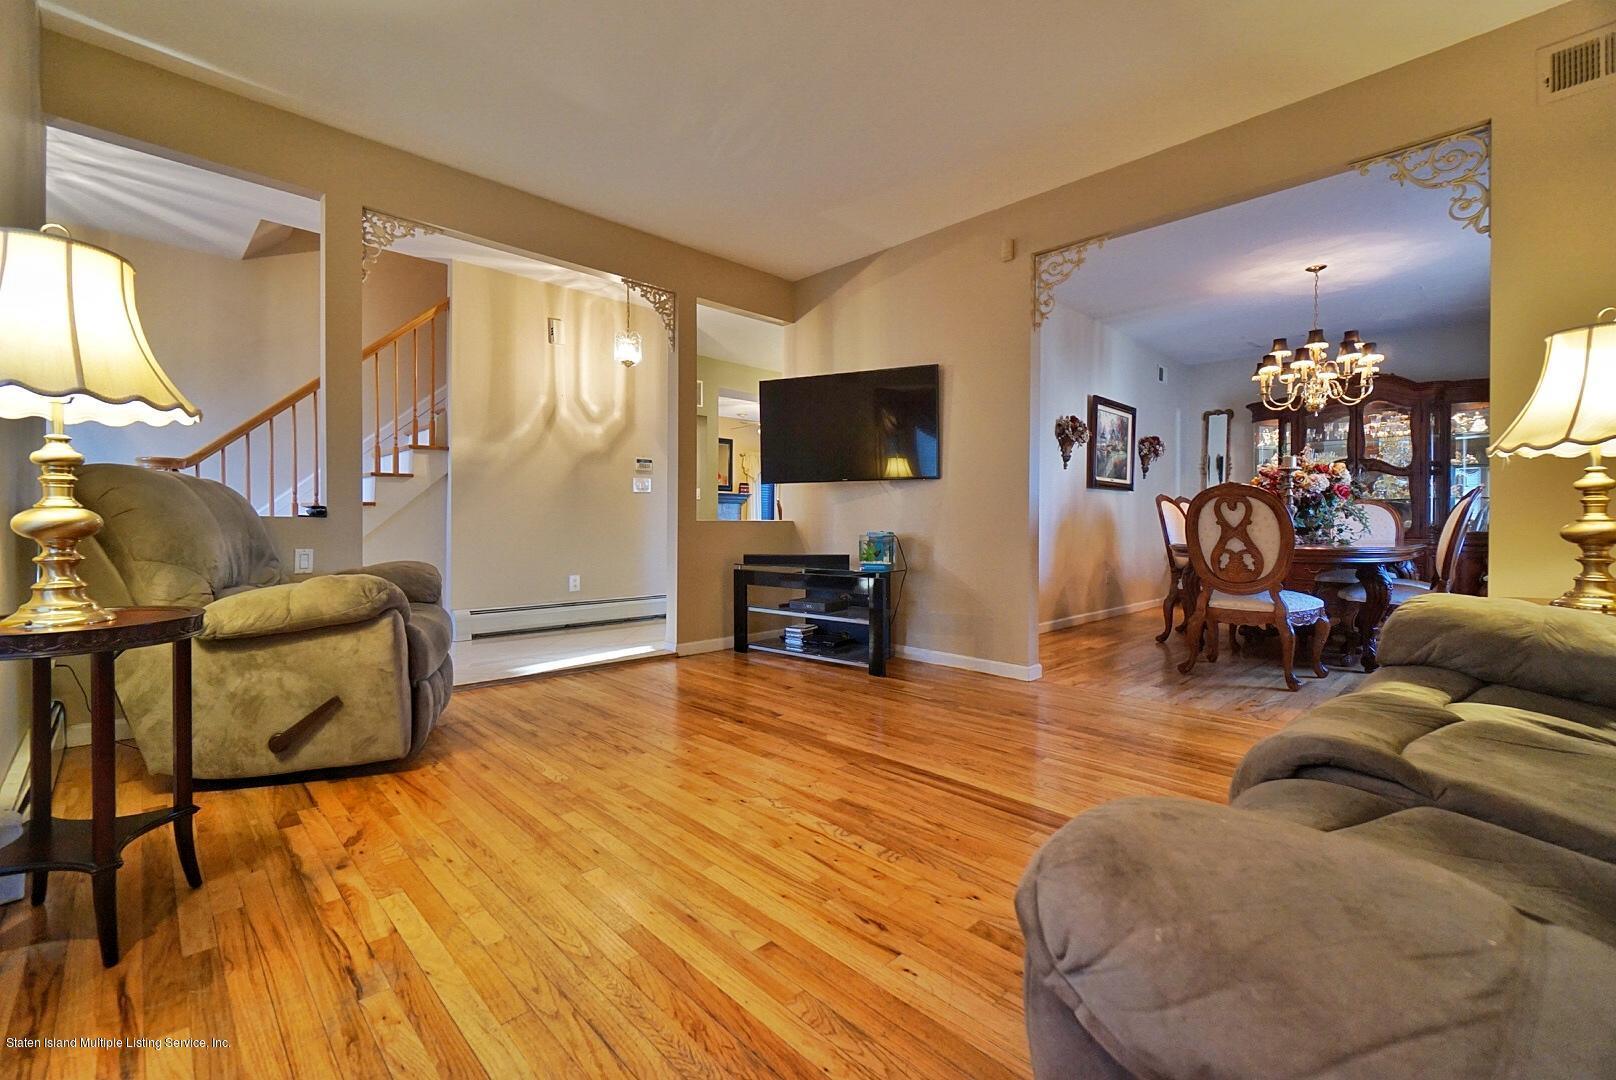 Single Family - Detached 120 Nashville Street  Staten Island, NY 10307, MLS-1127085-10